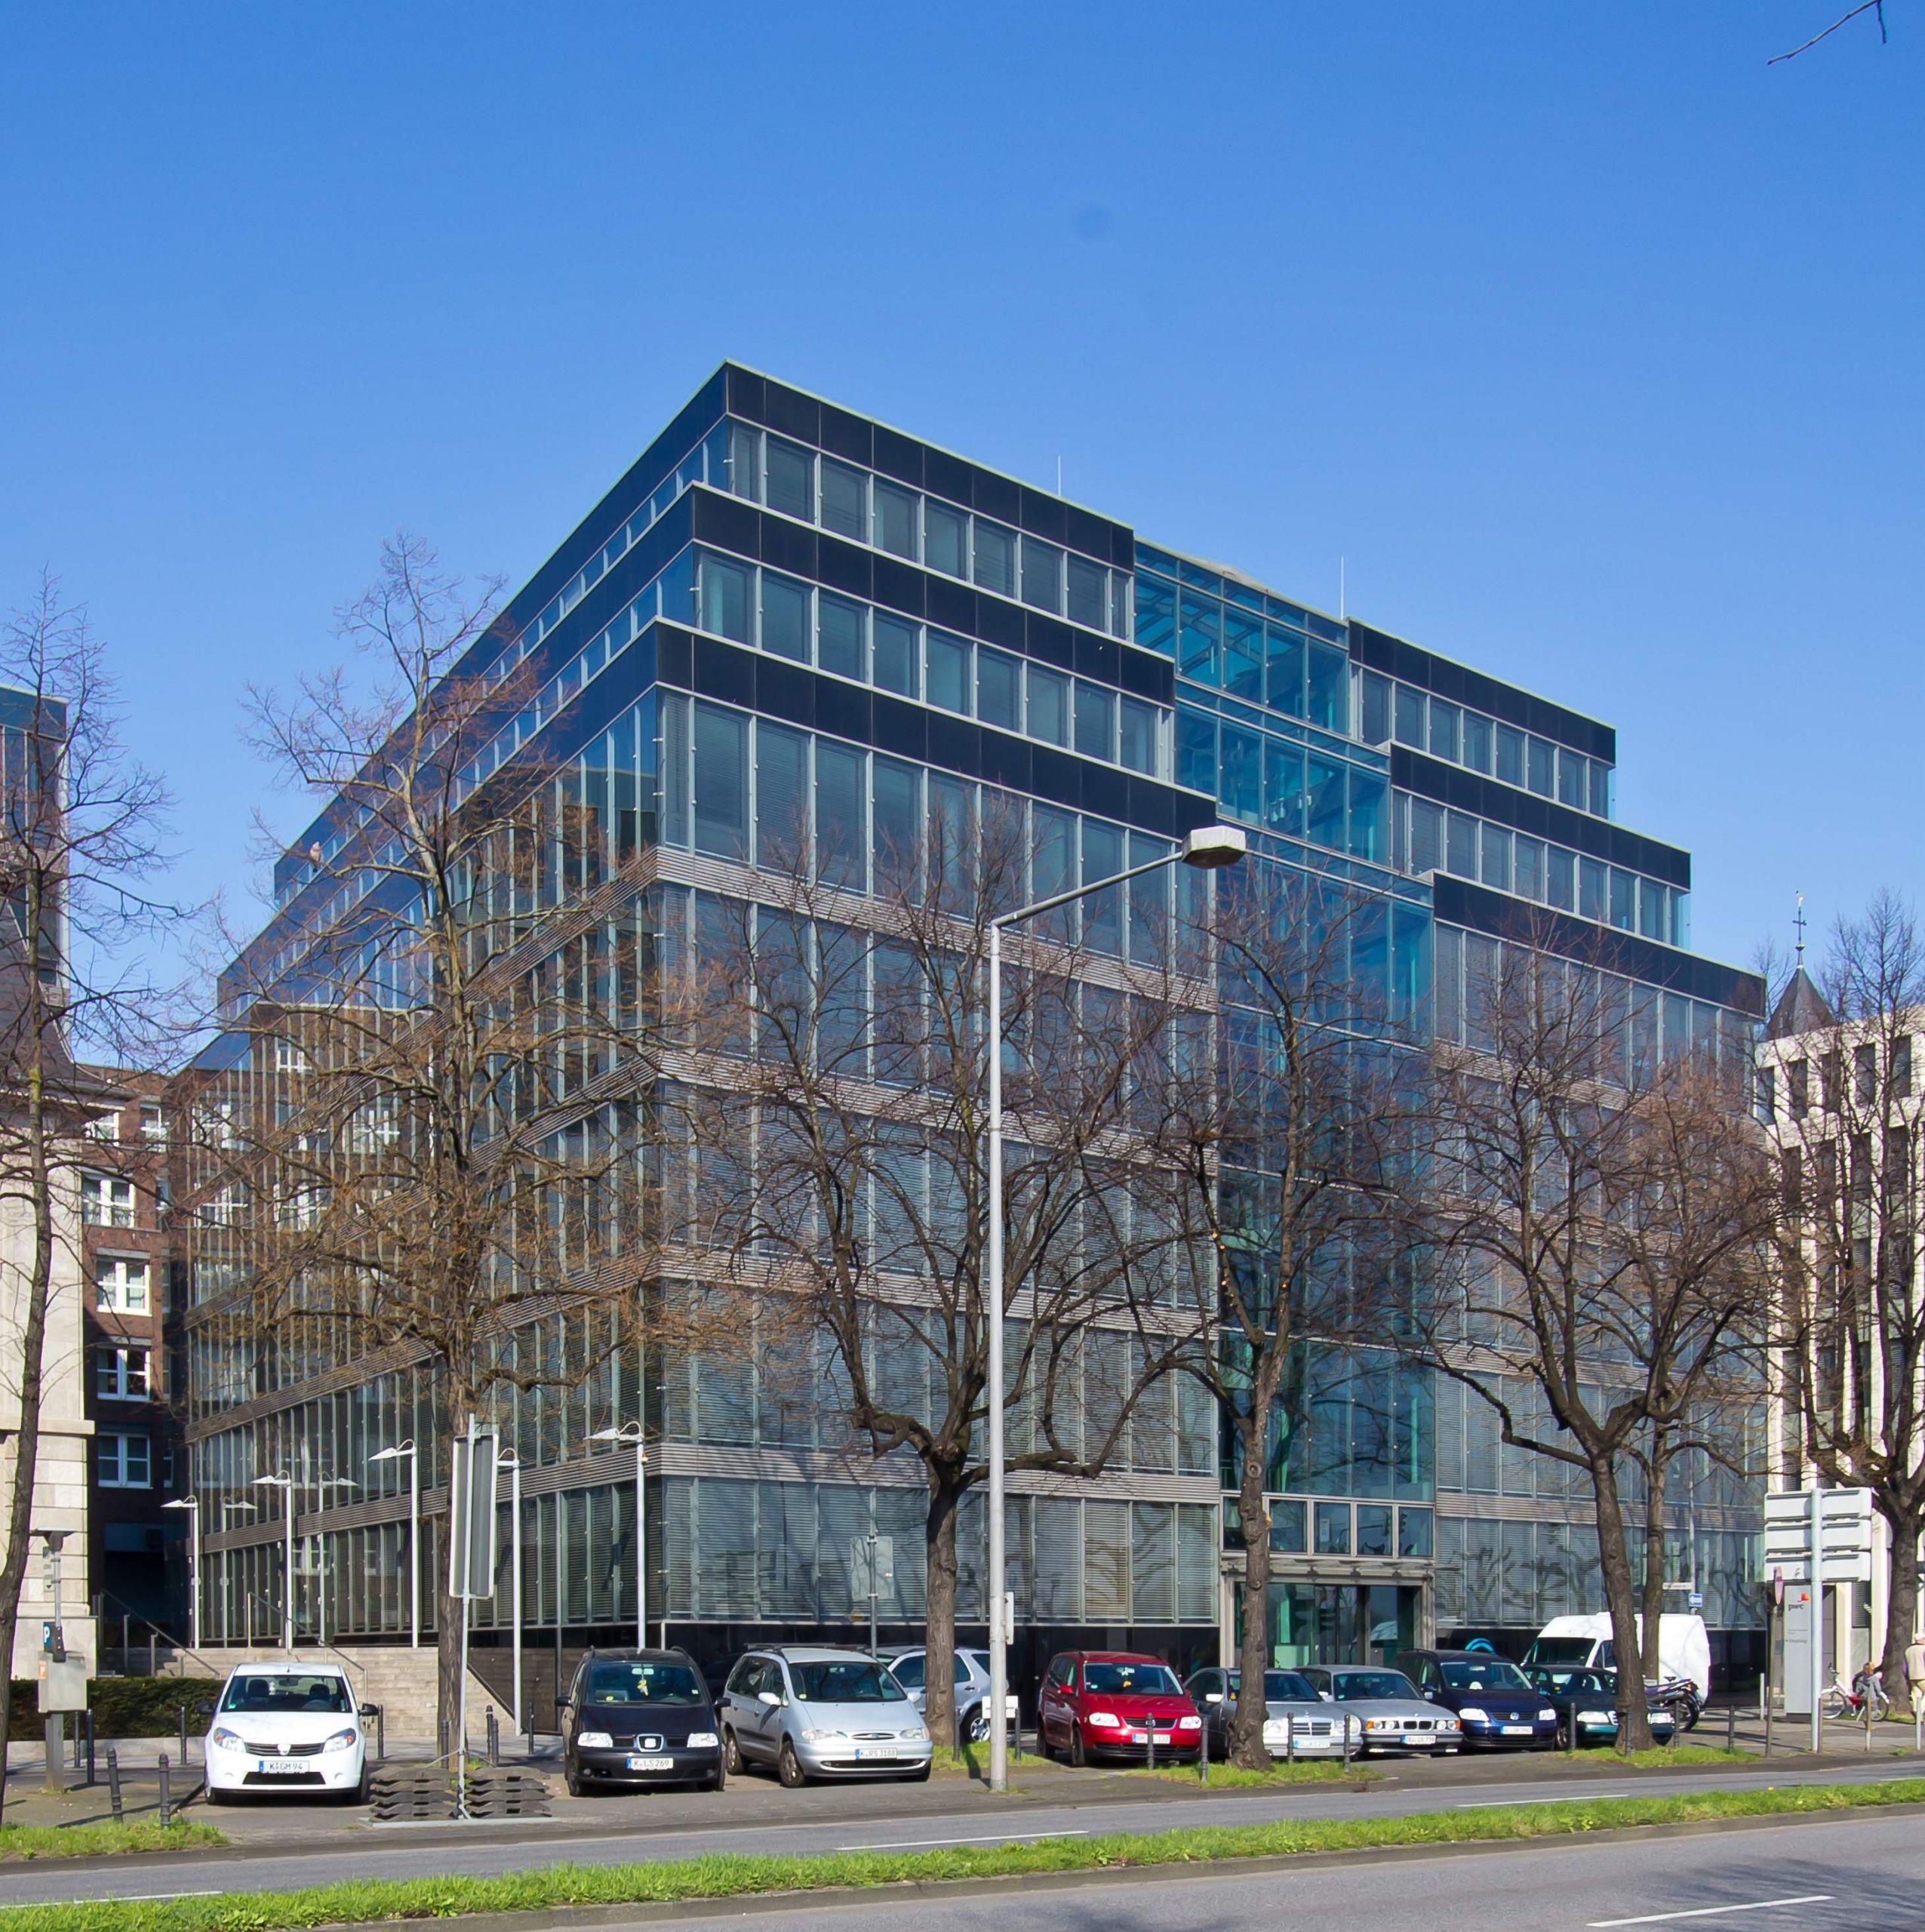 Bürogebäude RheinAtrium Konrad Adenauer Ufer 11 Köln 0188